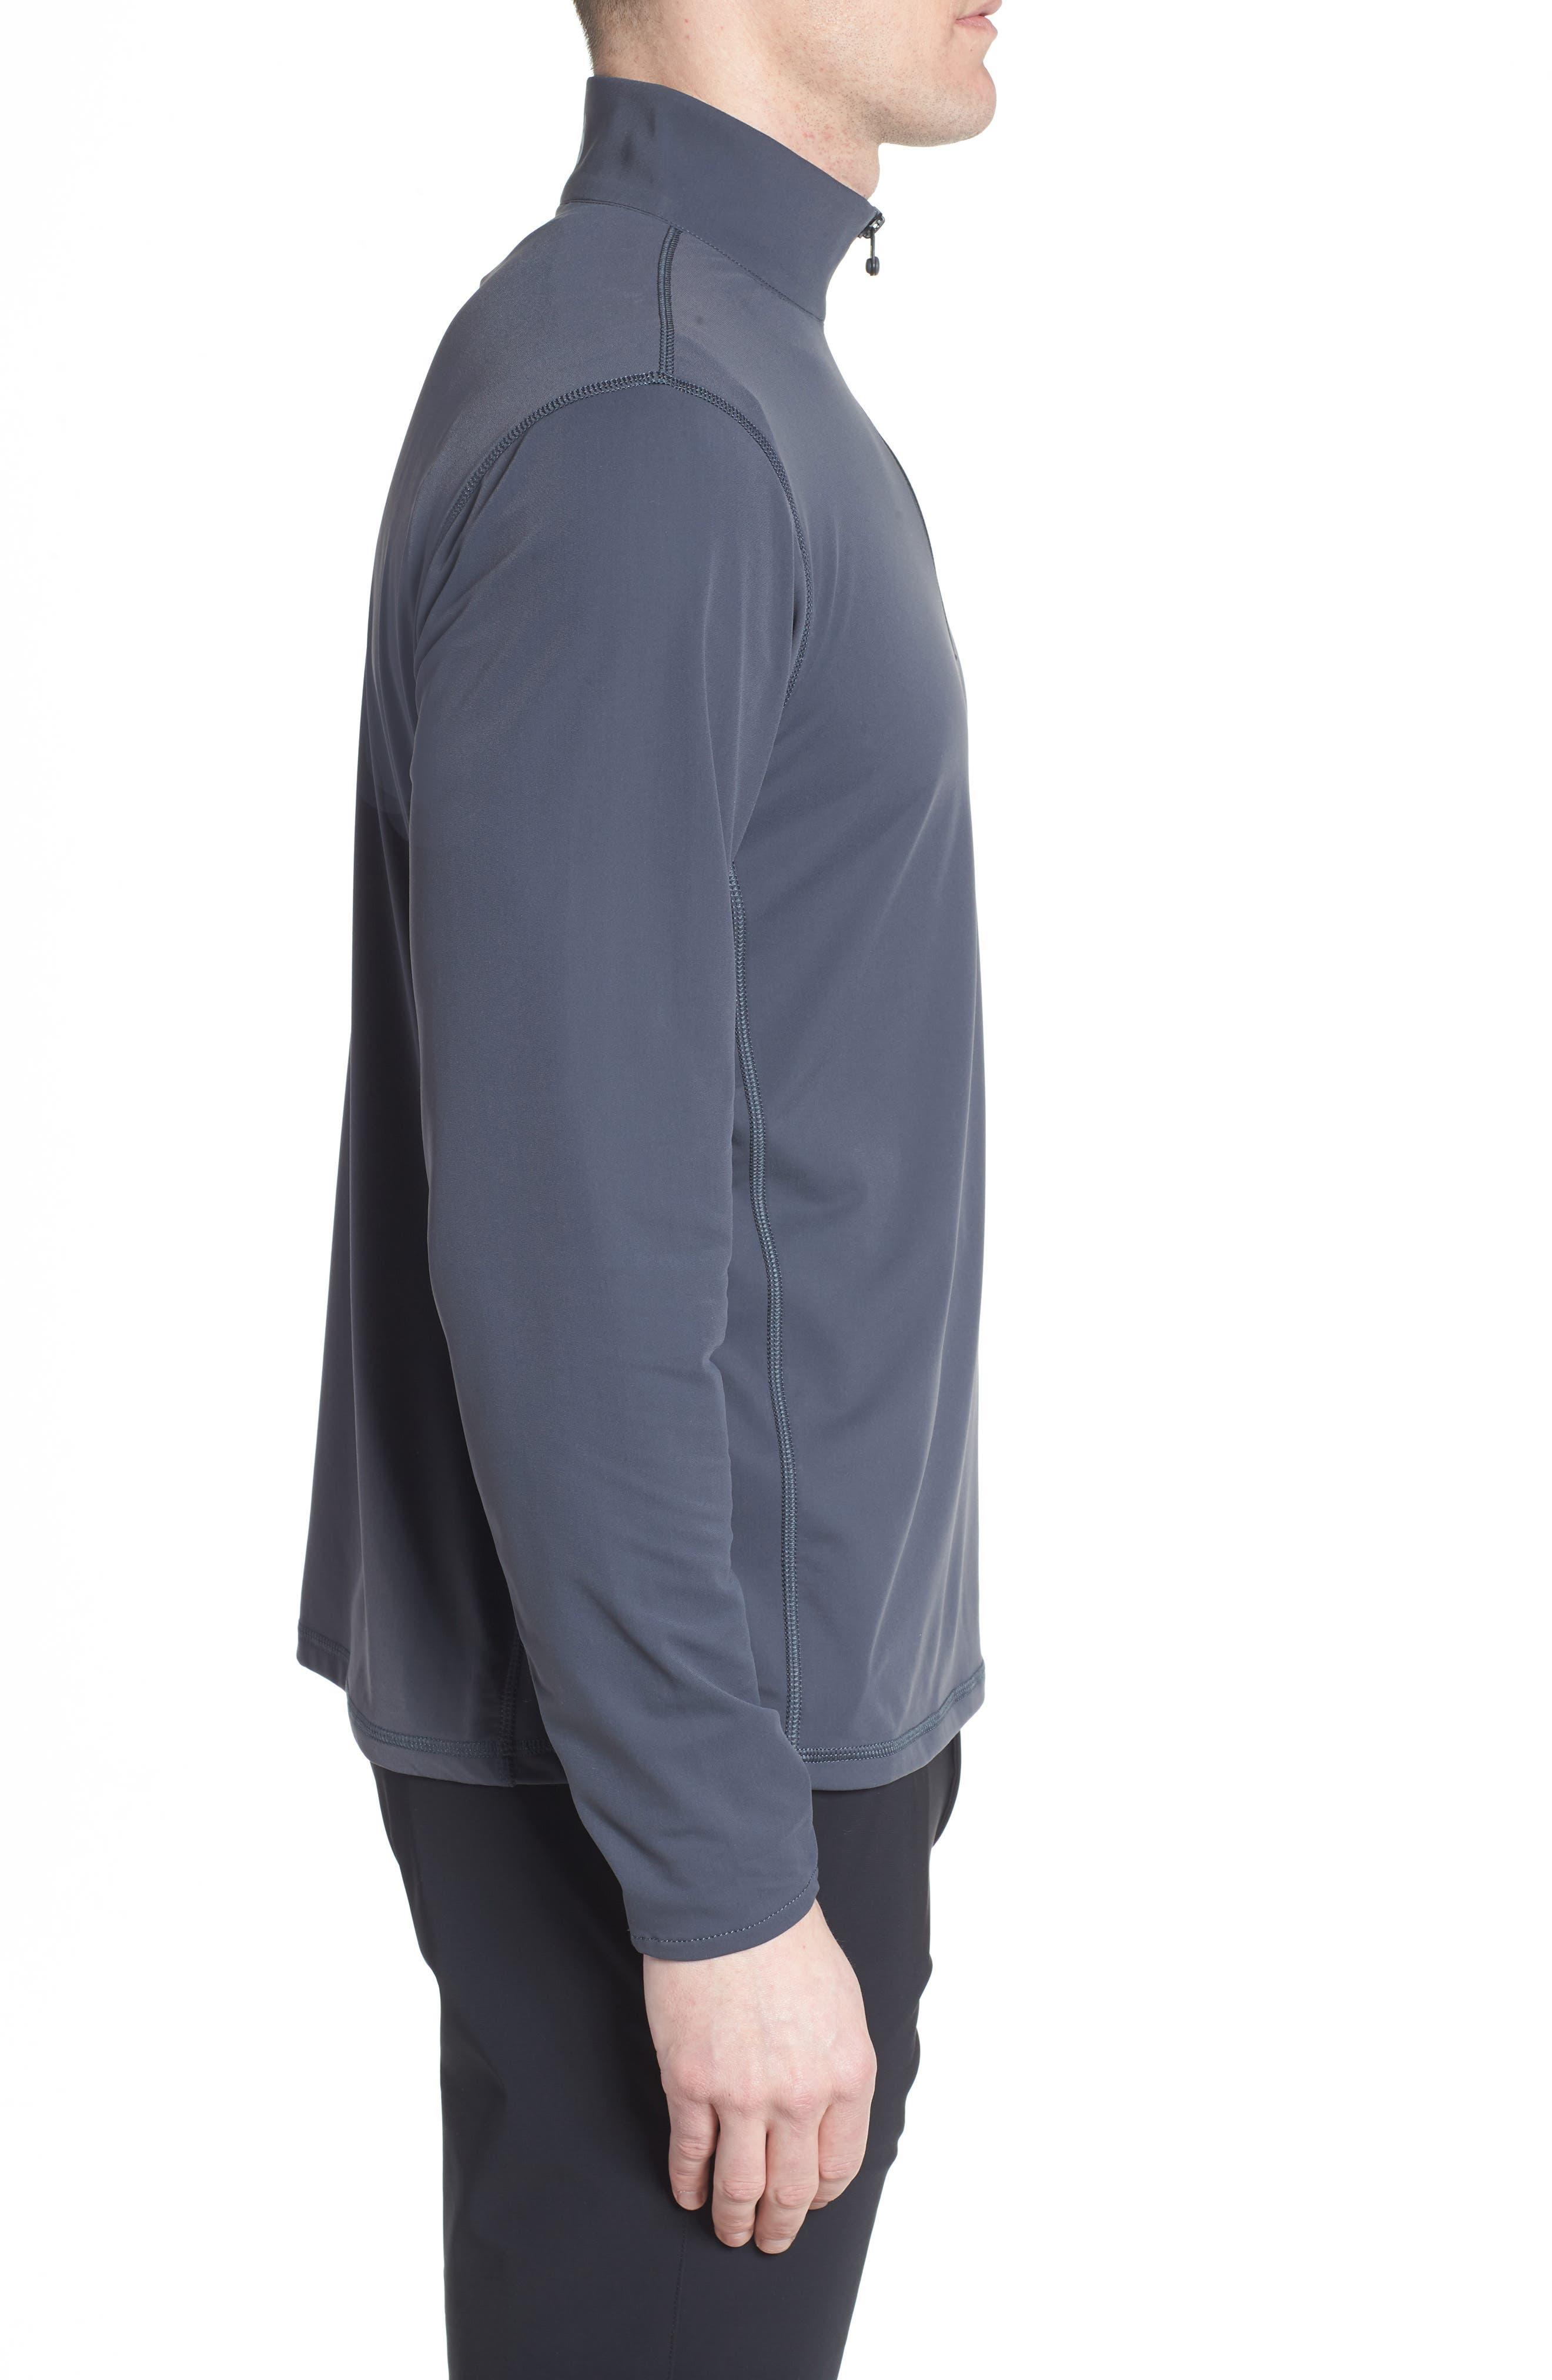 GREYSON,                             Tate Quarter Zip Pullover,                             Alternate thumbnail 3, color,                             020